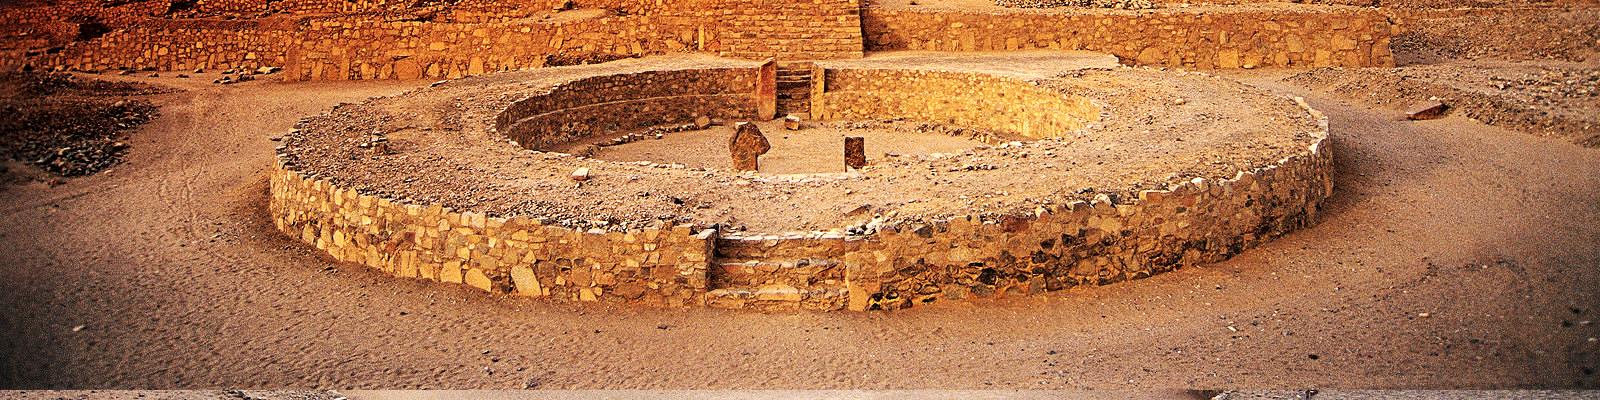 Ciudad Sagrada de Caral - Supe / Peru (Fonte: http://www.peru.travel/)